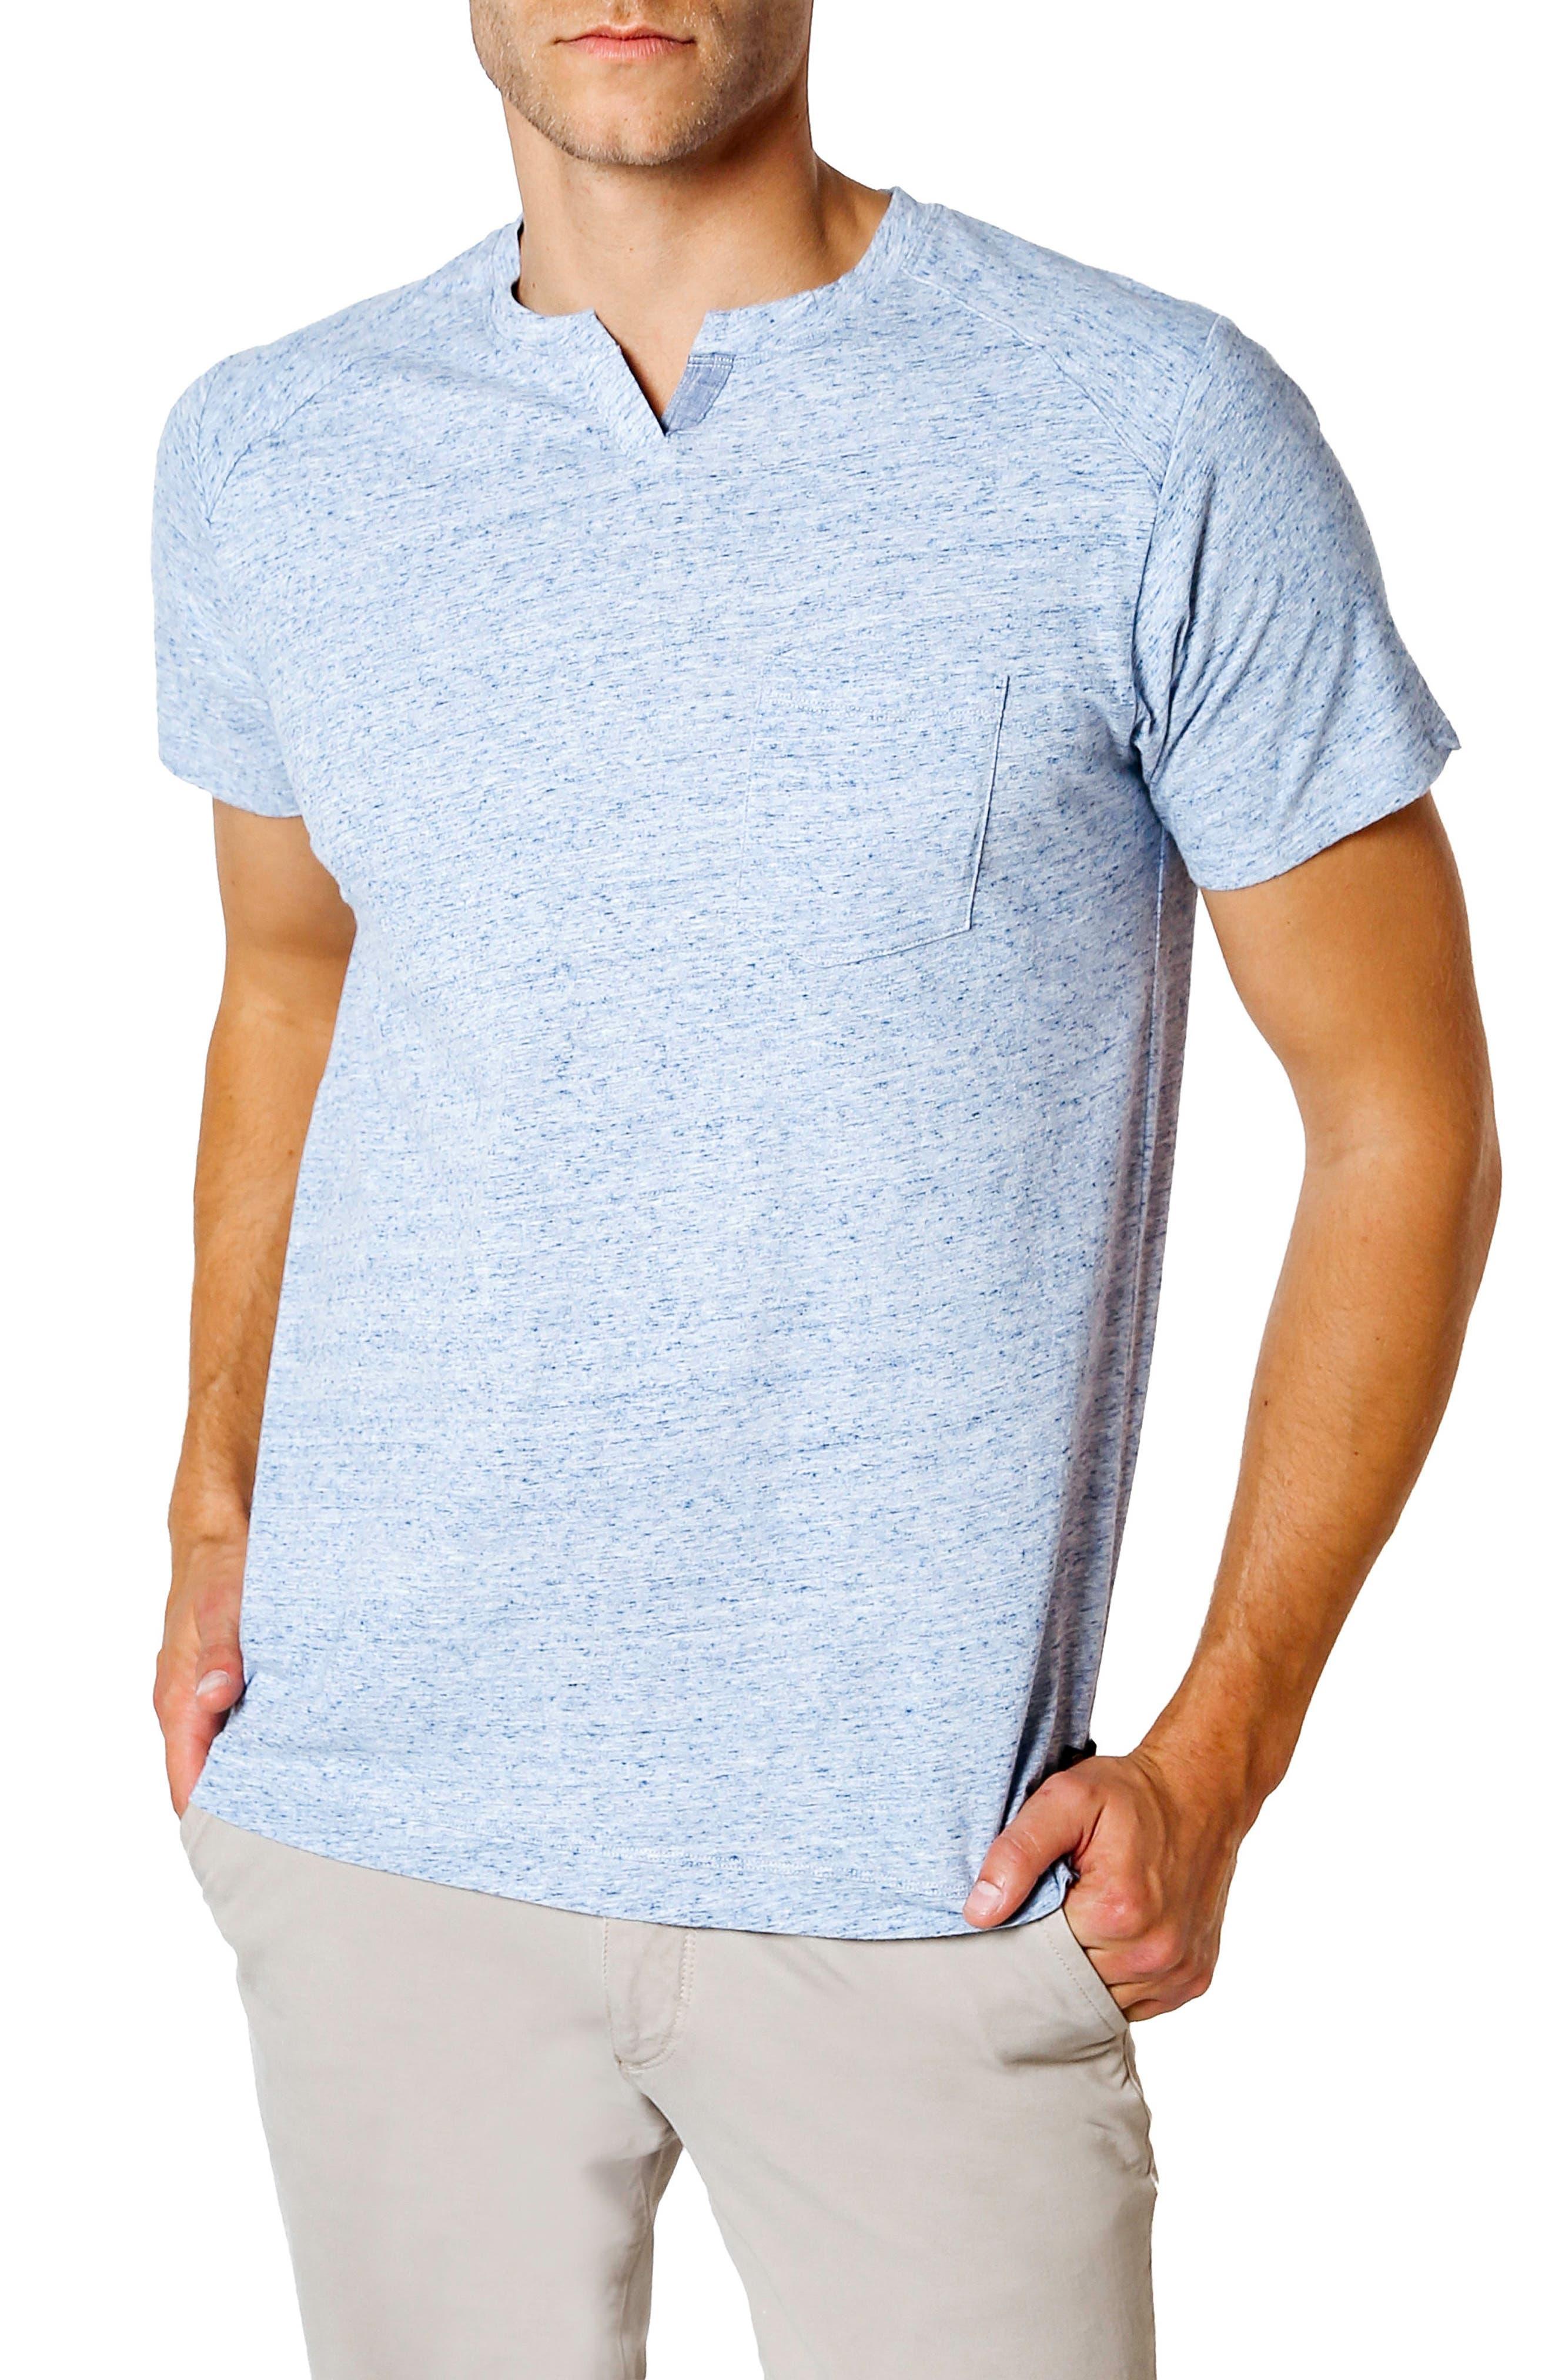 Slim Fit T-Shirt,                             Main thumbnail 1, color,                             Blue Heather